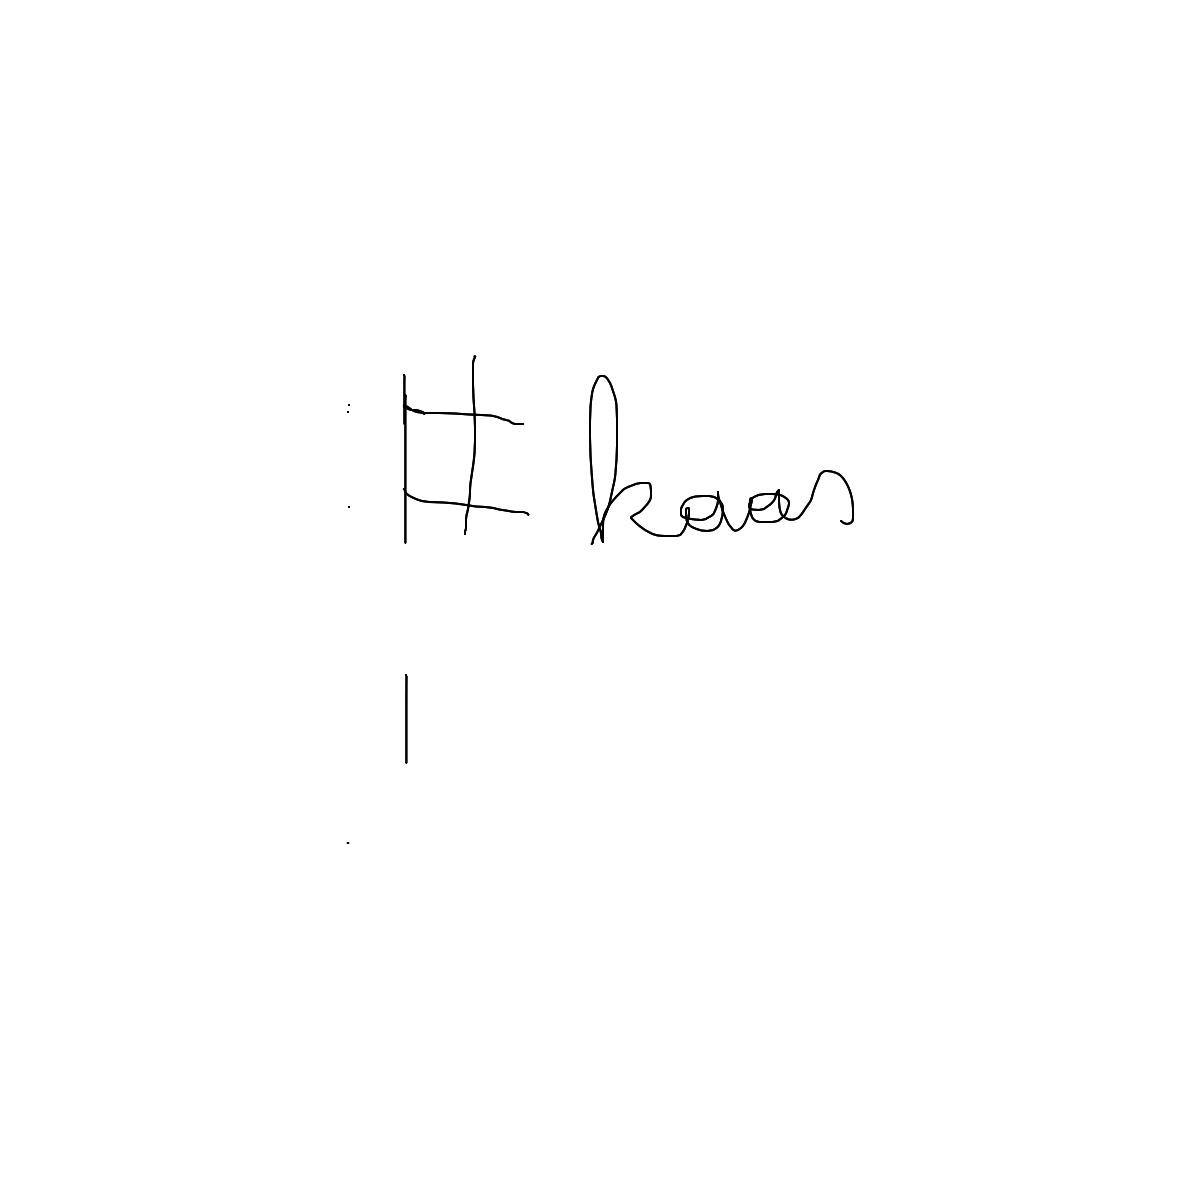 BAAAM drawing#7745 lat:51.6080474853515600lng: 5.0892400741577150